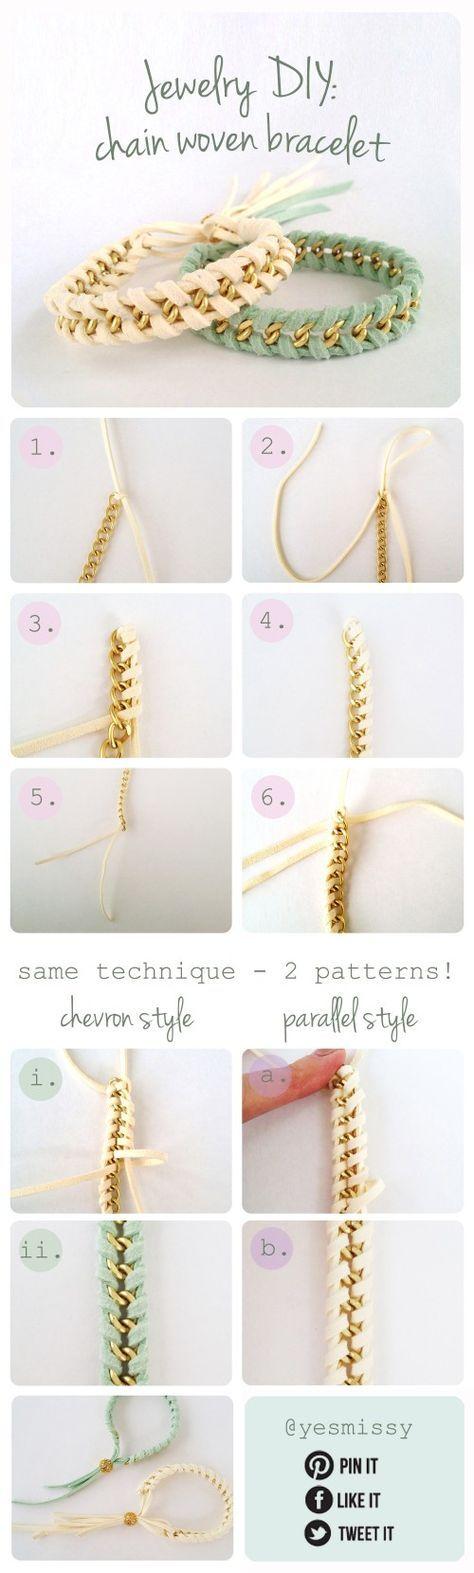 DIY Chain Woven Bracelet Tutorial #diy #bracelet